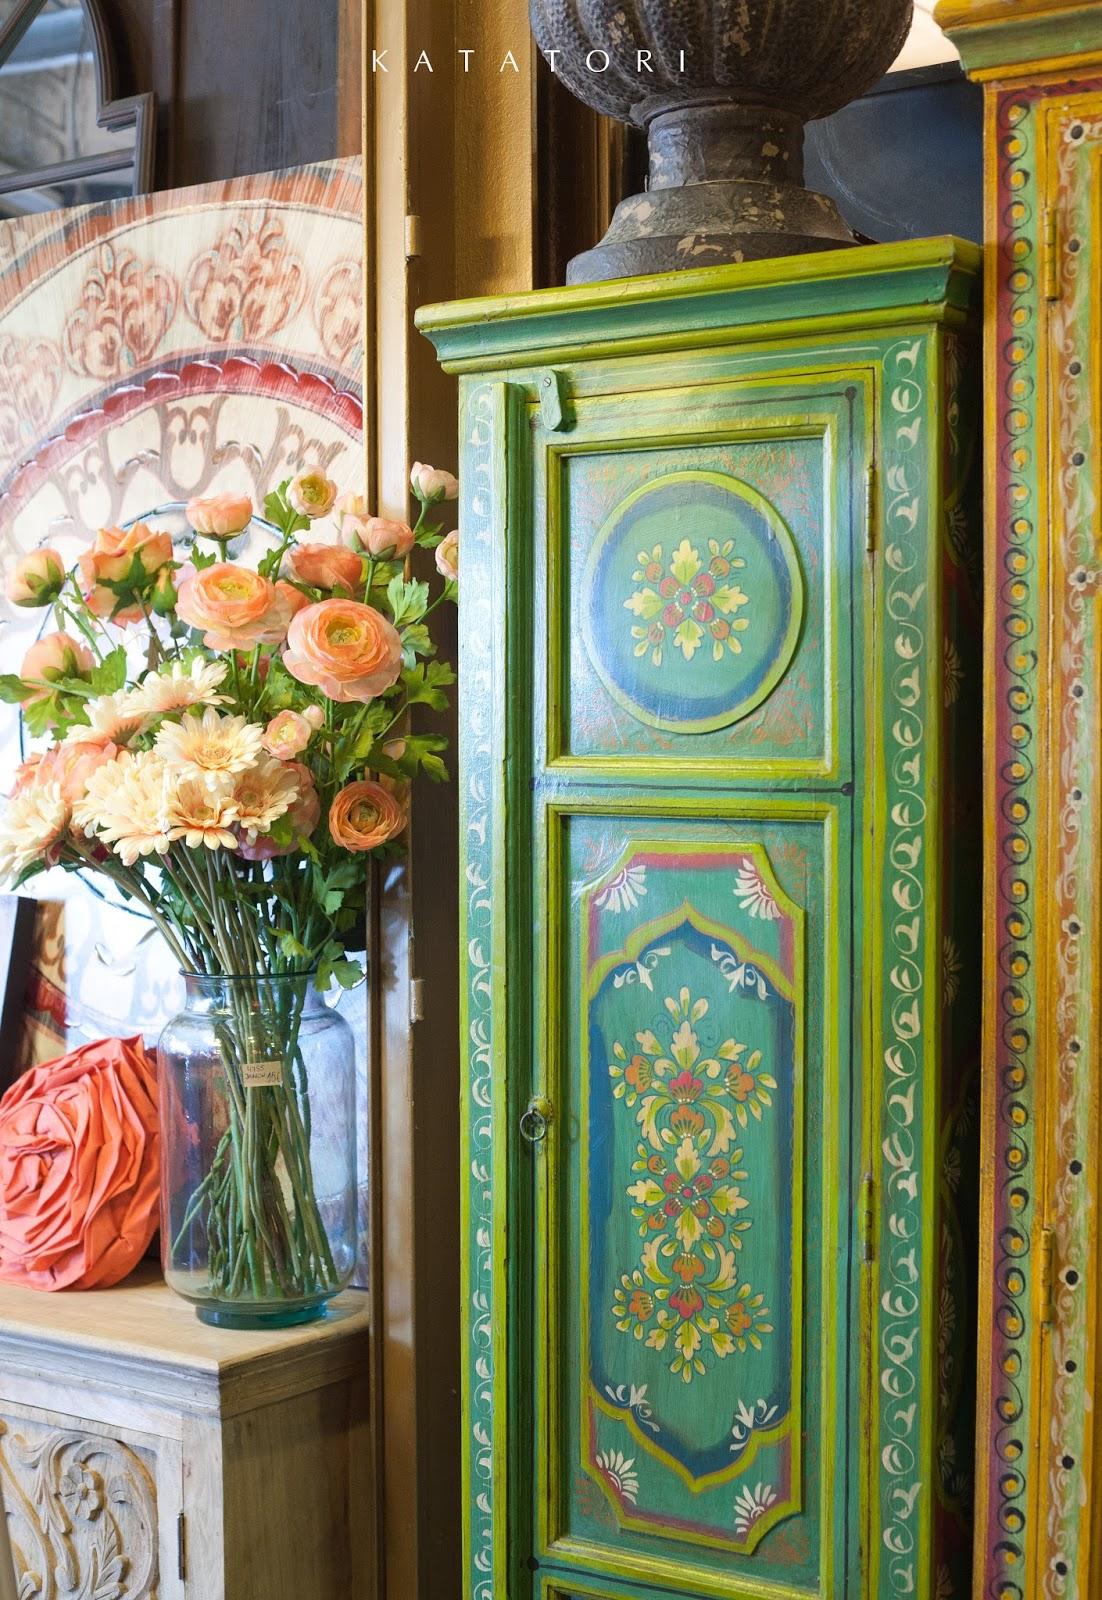 Katatori interiores muebles pintados a mano - Disenos muebles pintados ...